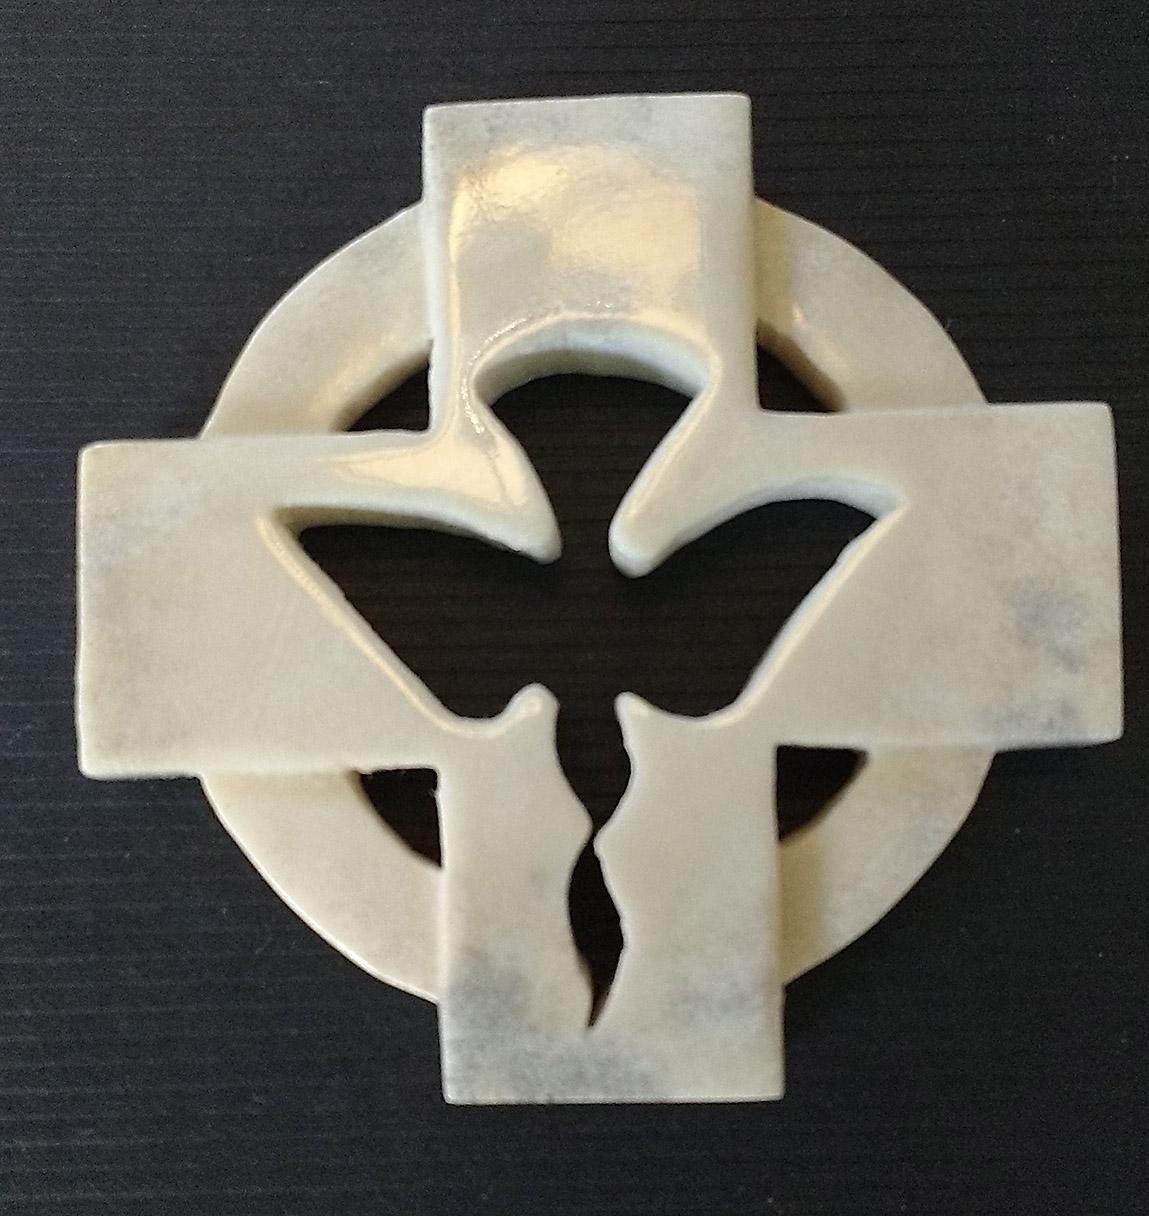 Diakon kors med duva. Täljaren skapar unika presenter